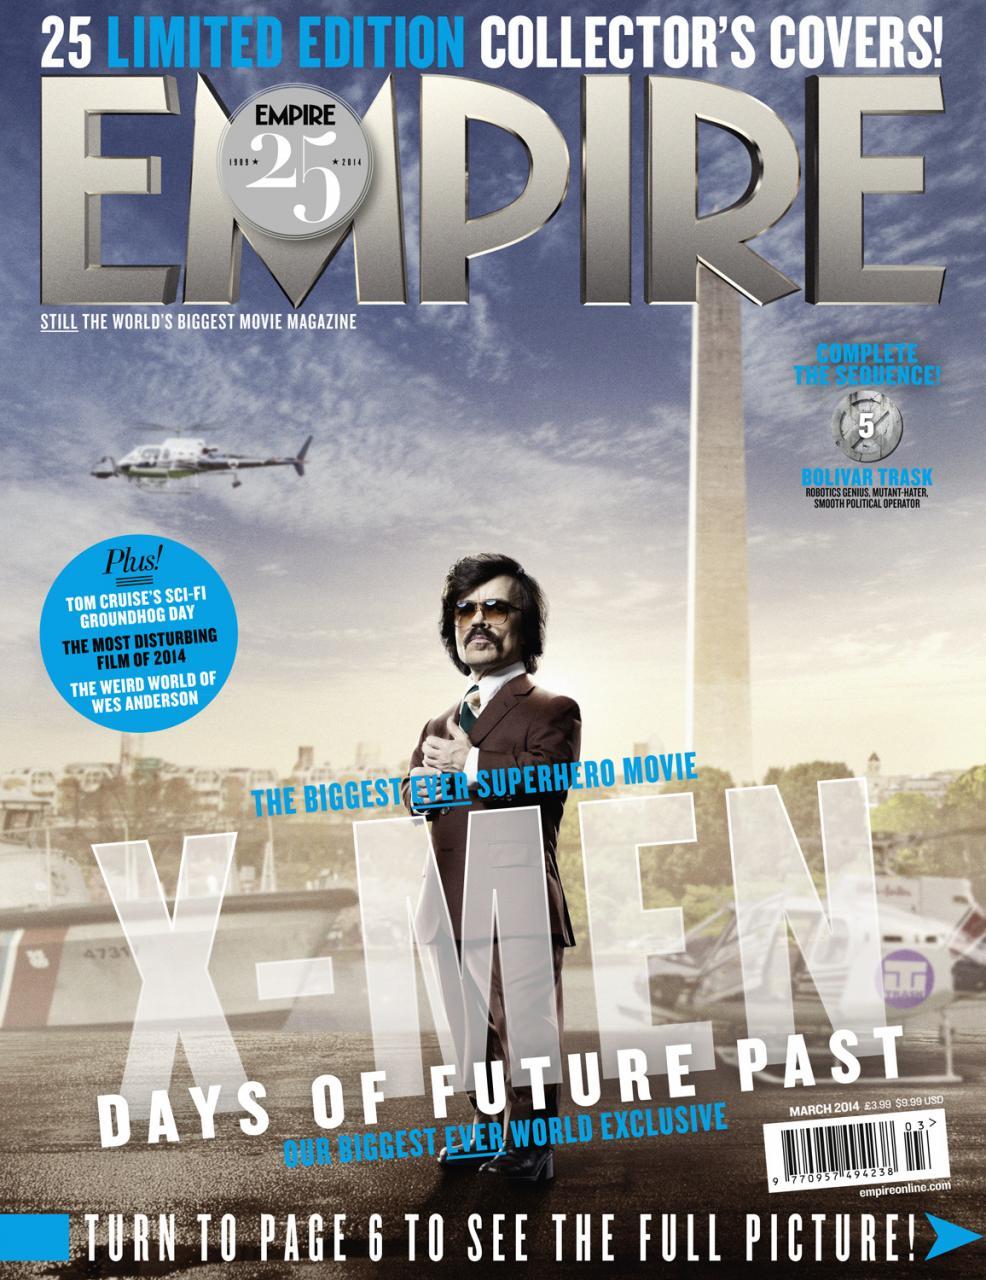 X-MEN DAYS OF FUTURE PAST Empire Magazine Covers  (14)